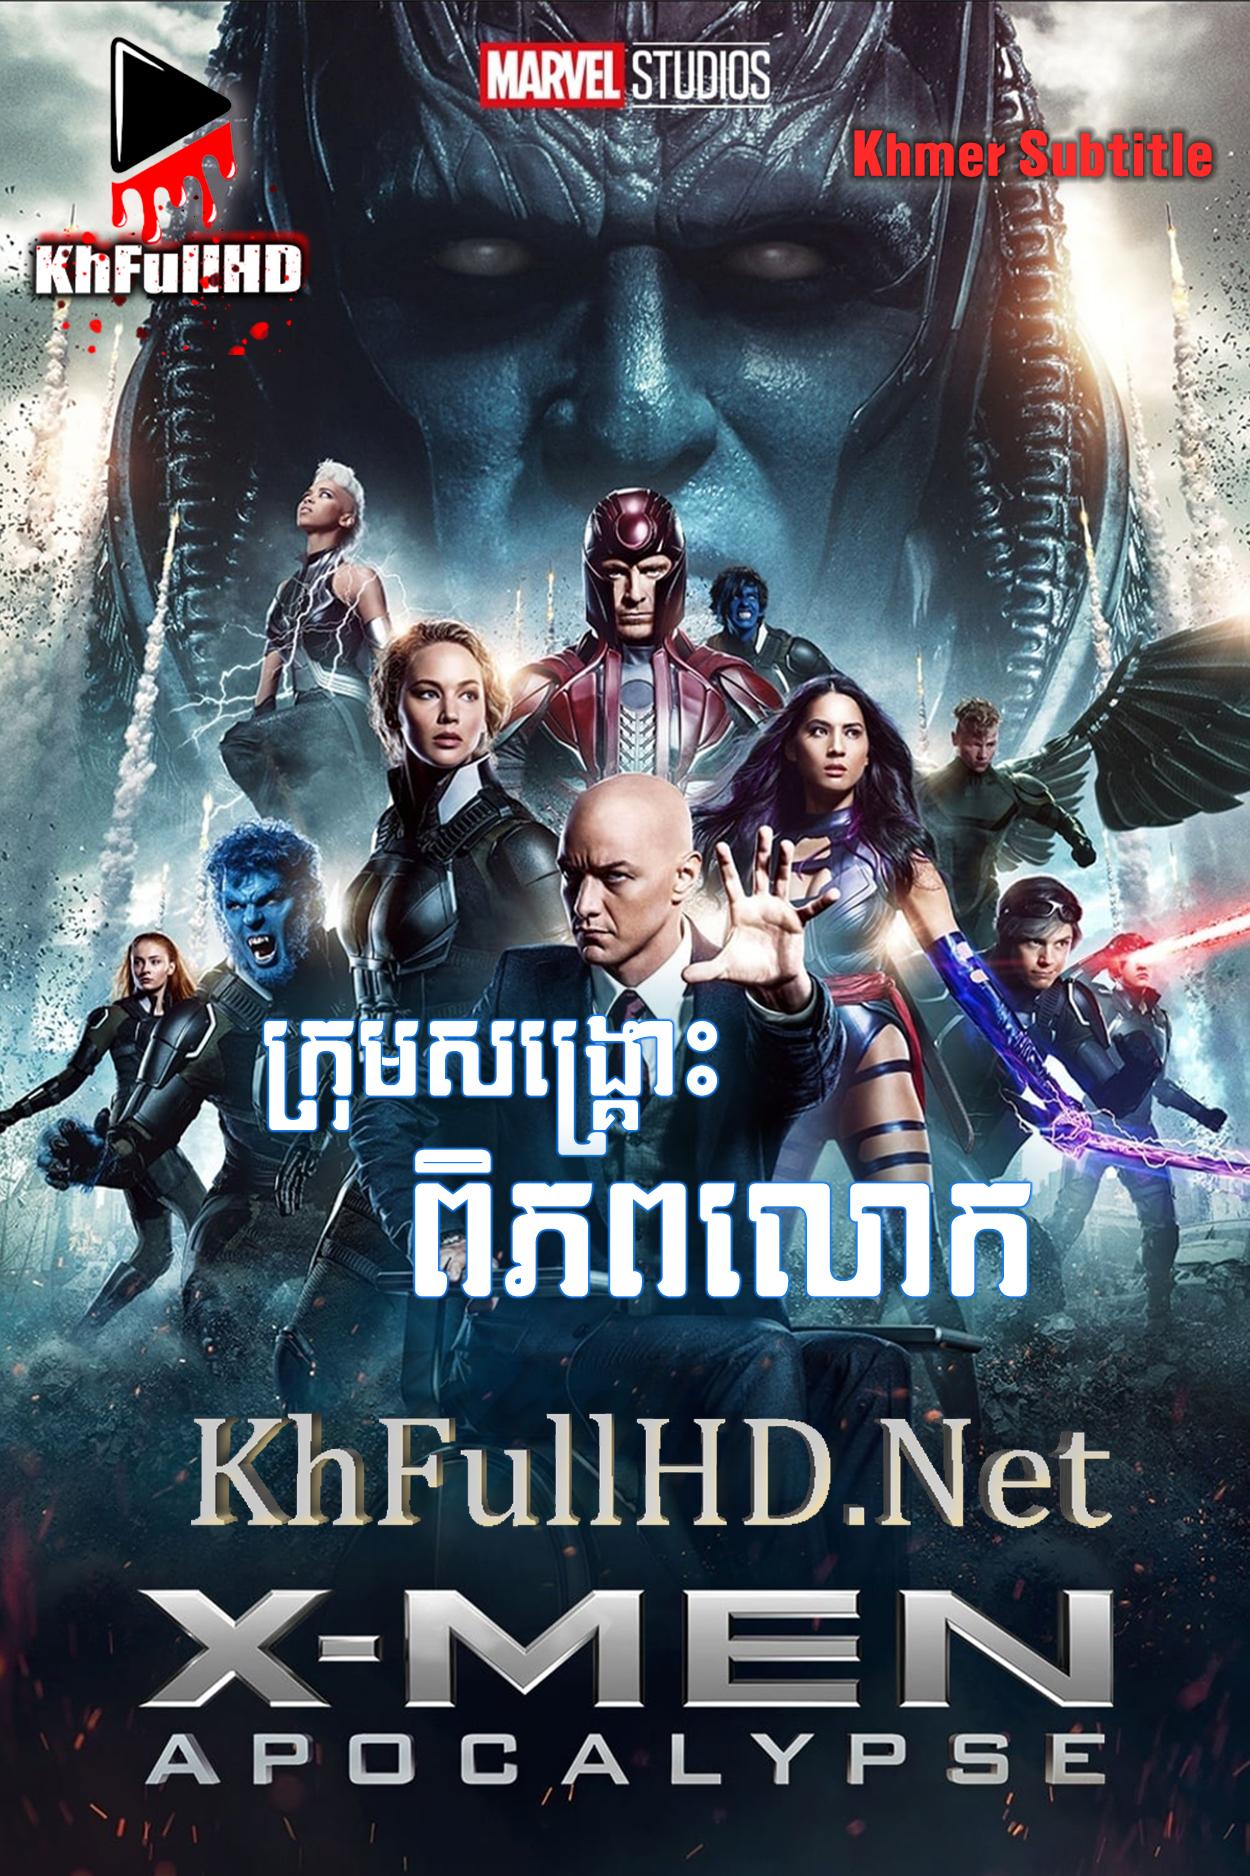 X-Men: Apocalypse-Khmer Sub (2016)